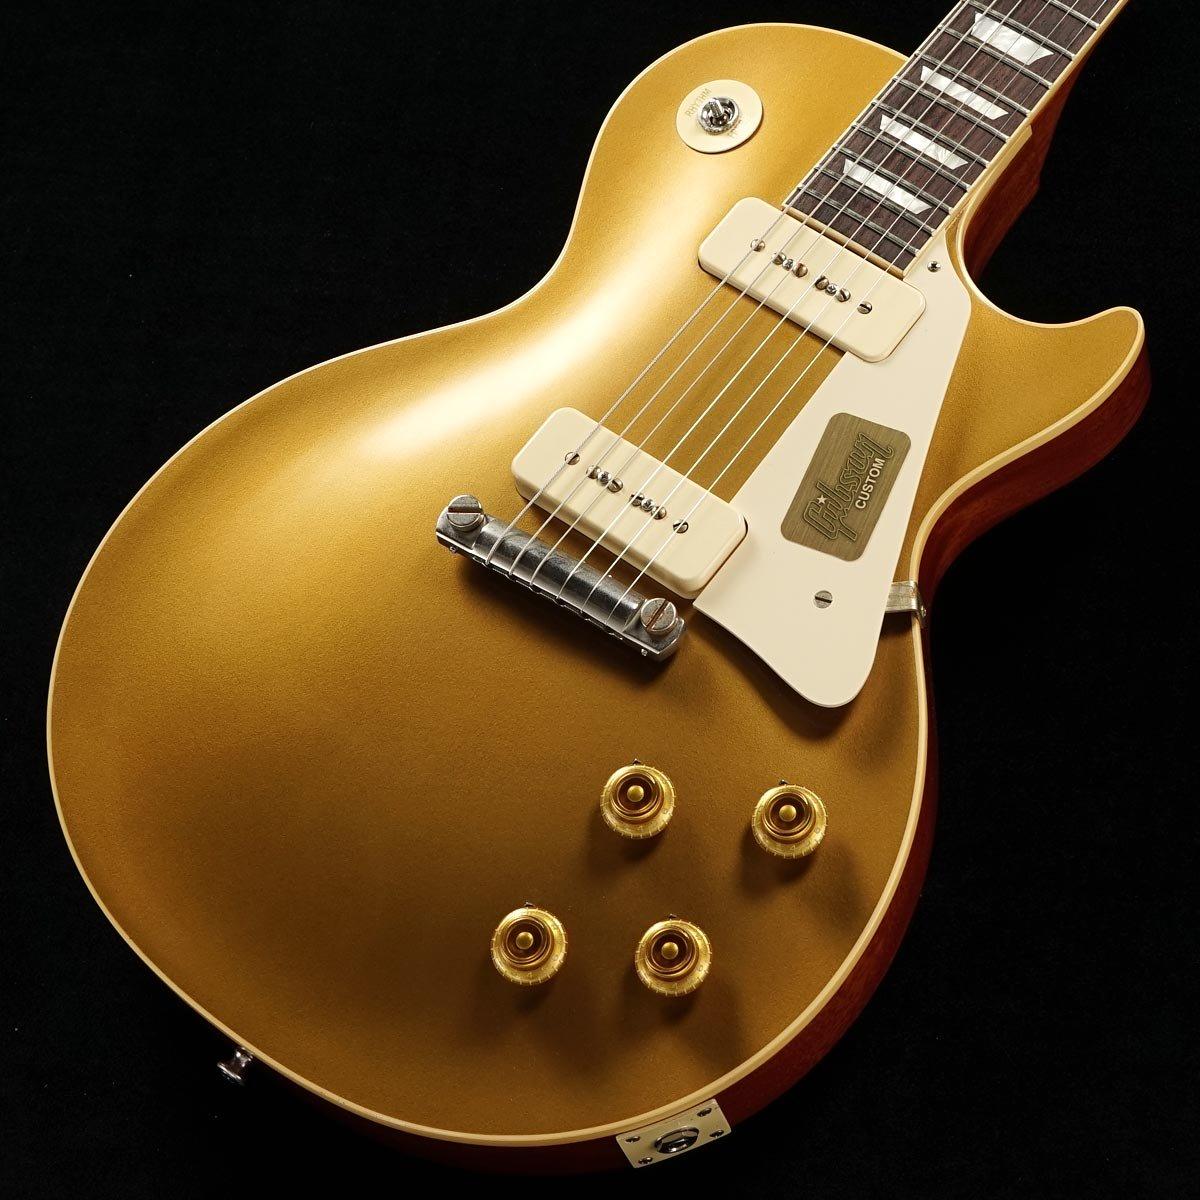 Gibson Custom / Limited Run 1954 Les Paul V.O.S Antique Gold B076J7PCRF